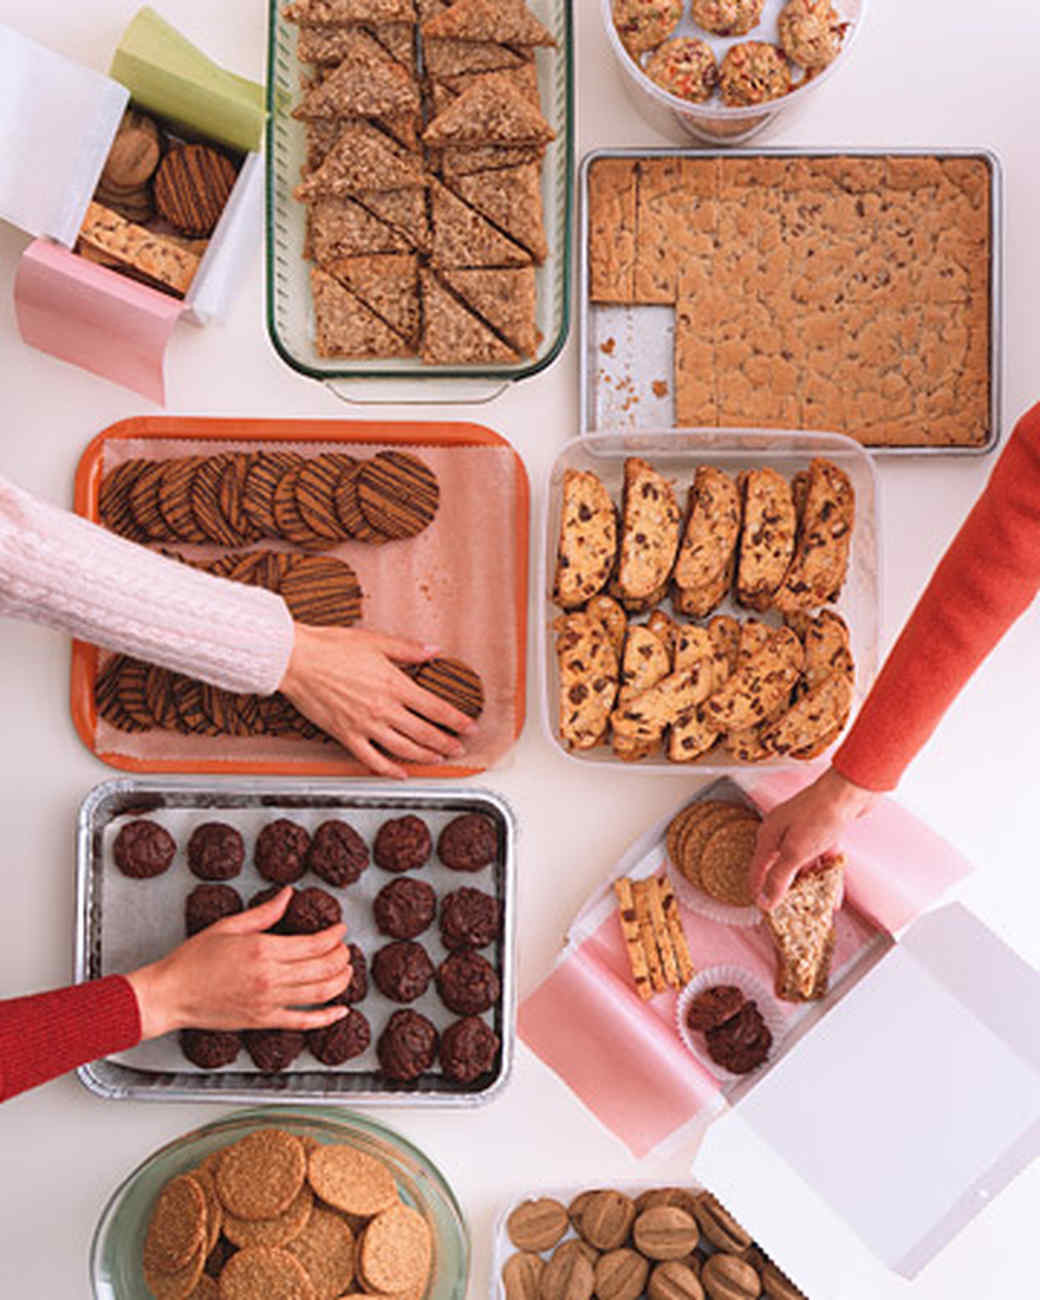 Storing Christmas Cookies  Storing and Packaging Cookies